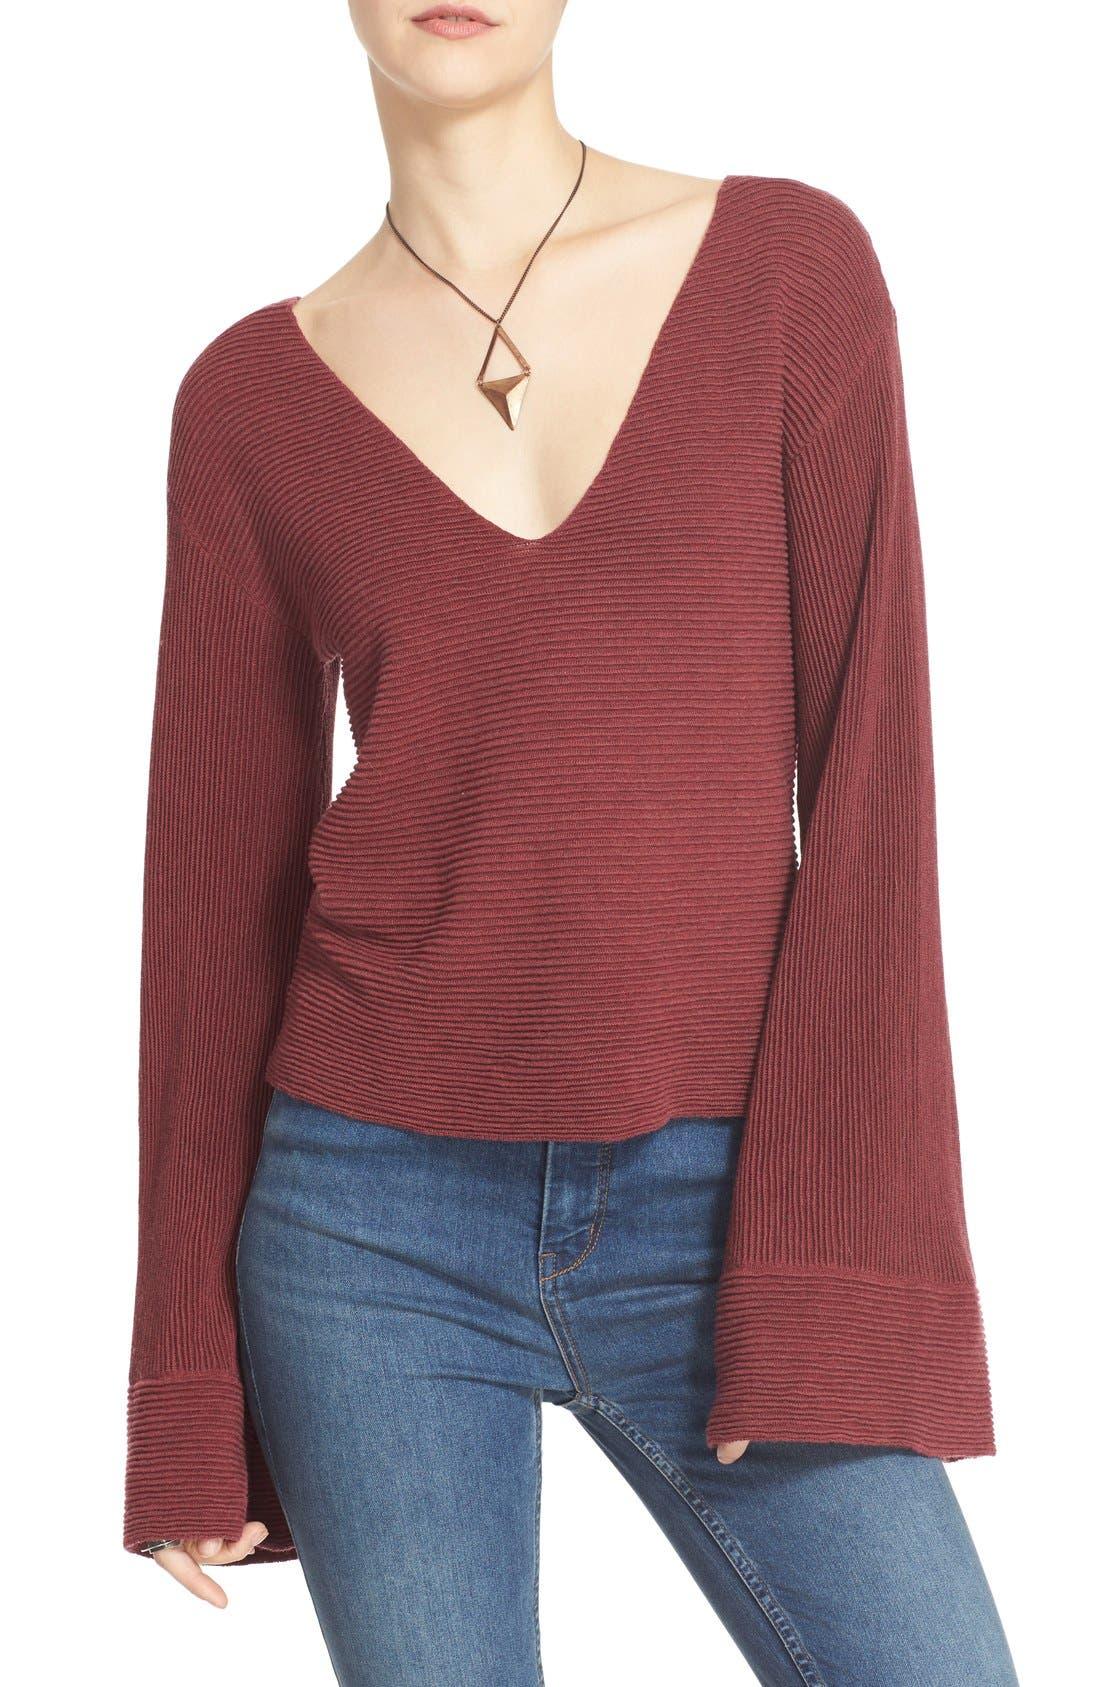 Main Image - Free People 'Starman' Rib Knit Pullover